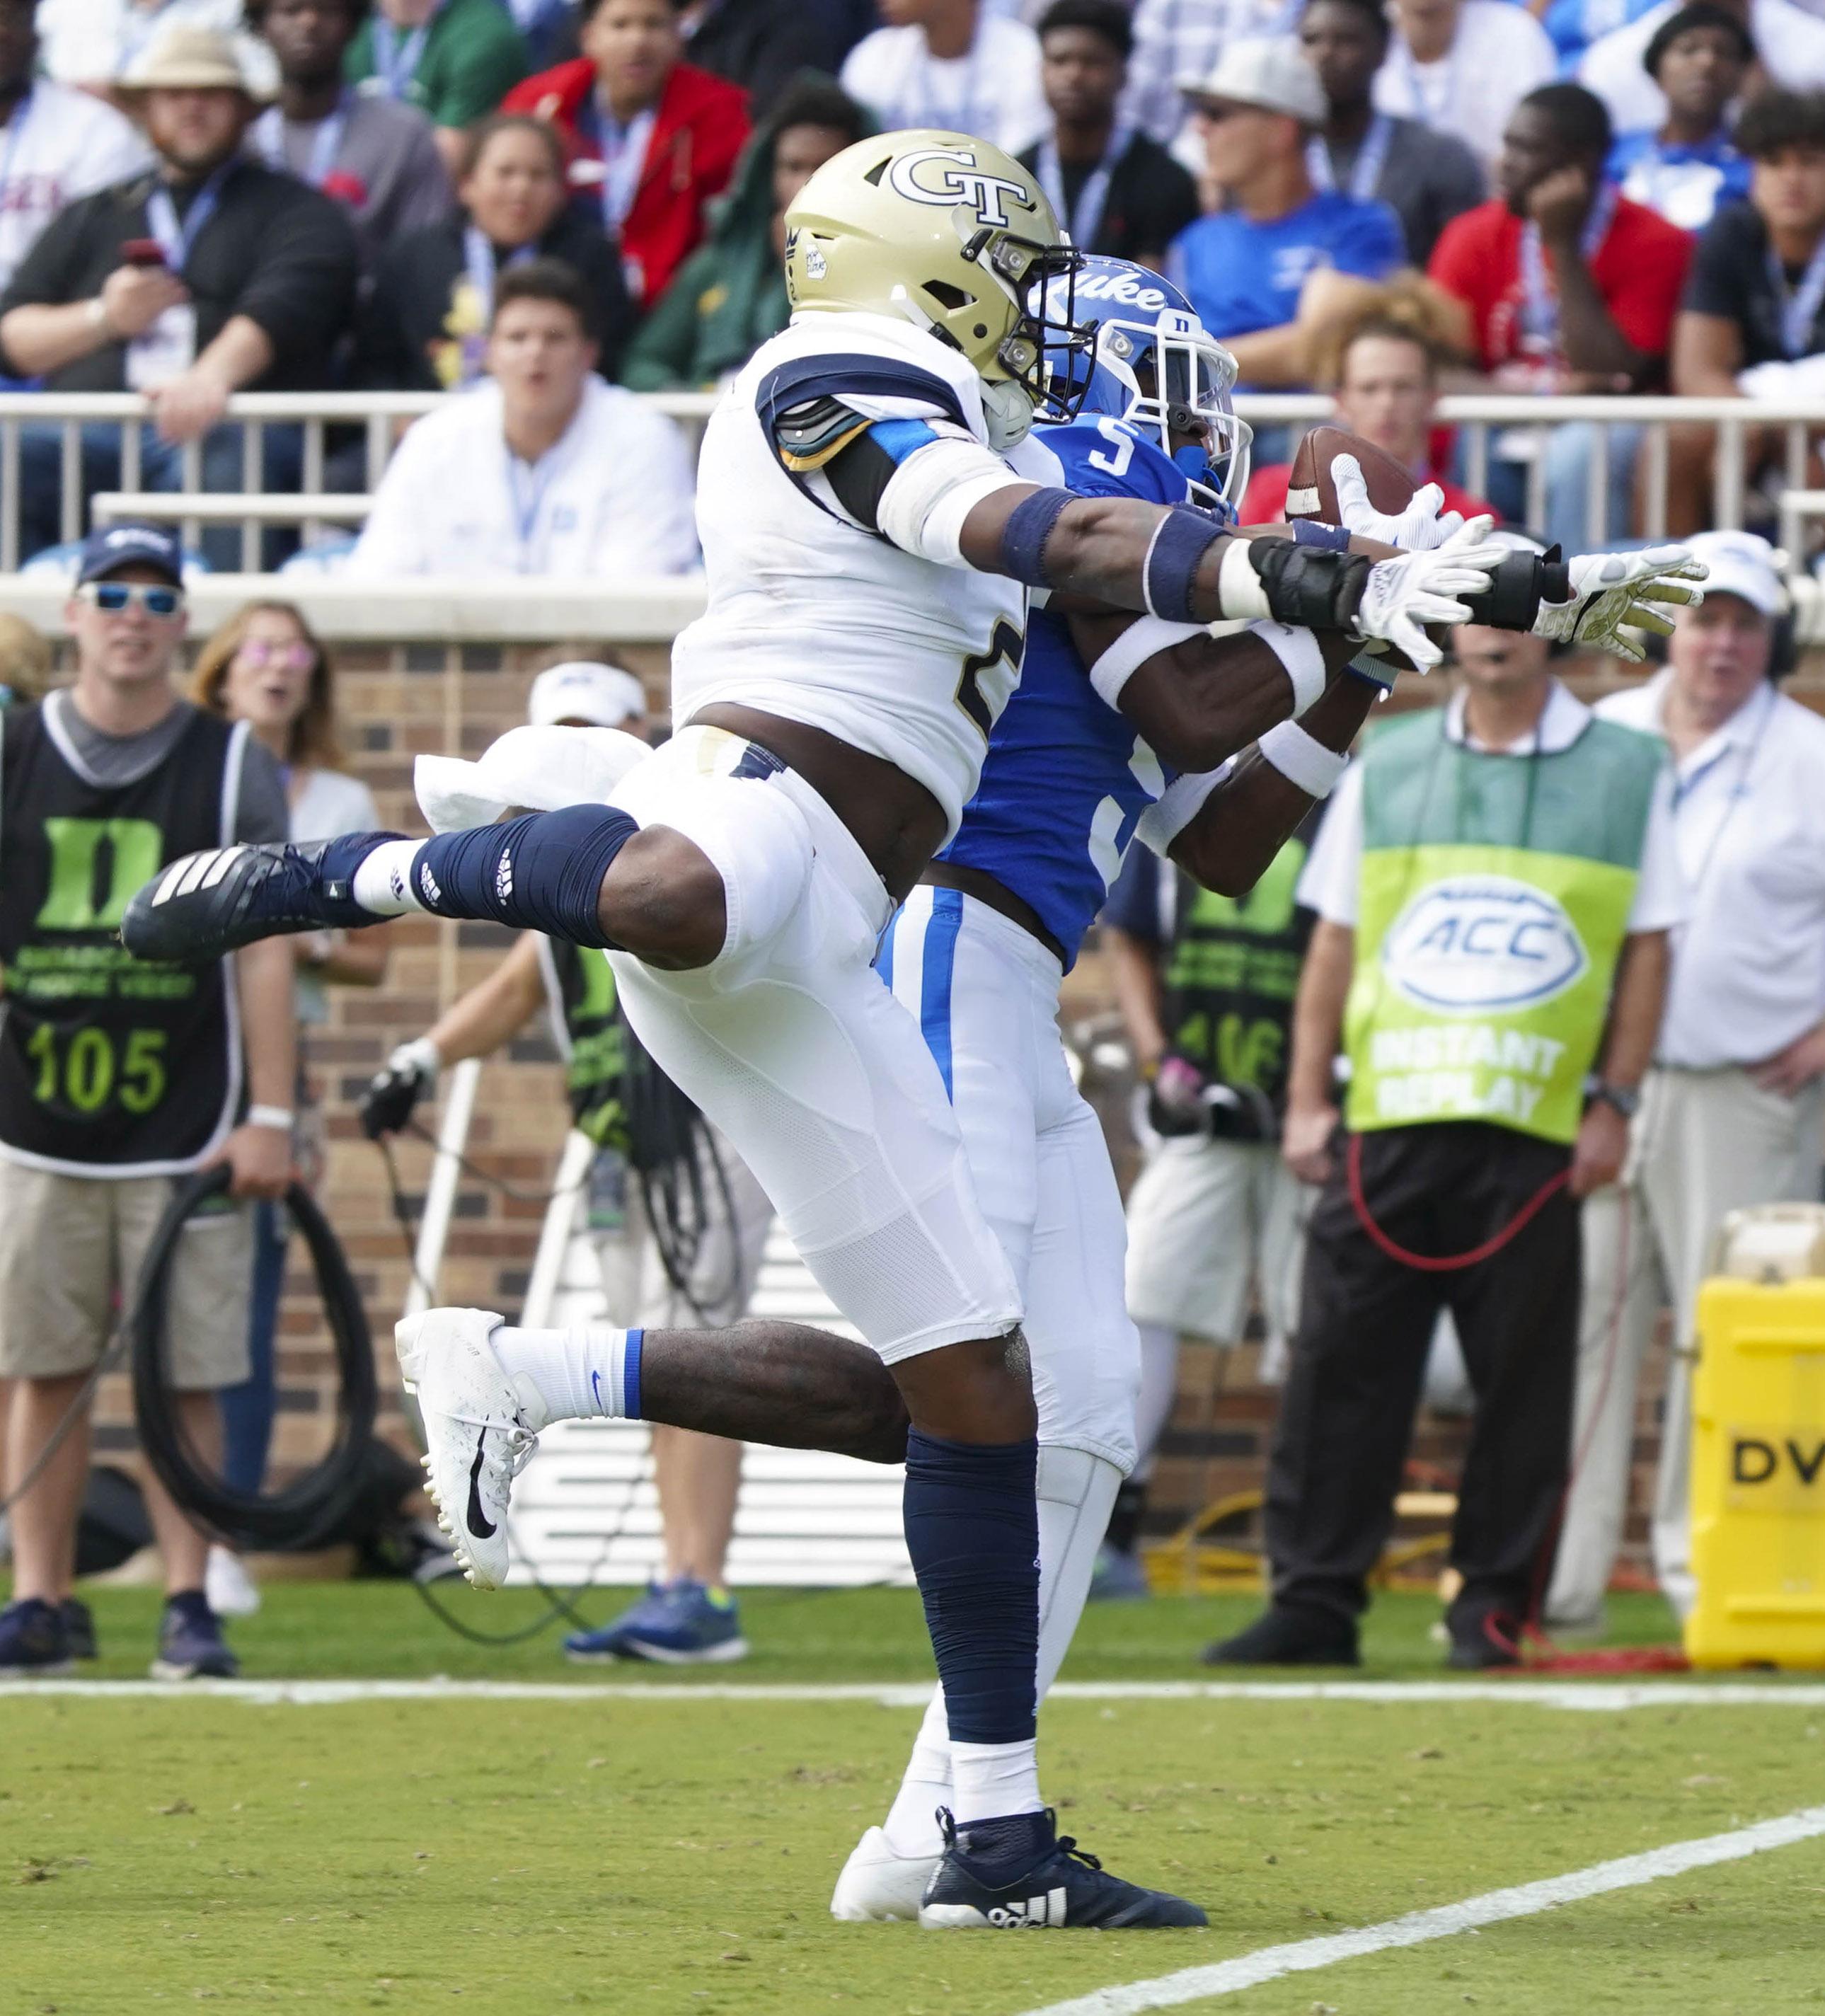 NCAA Football: Georgia Tech at Duke